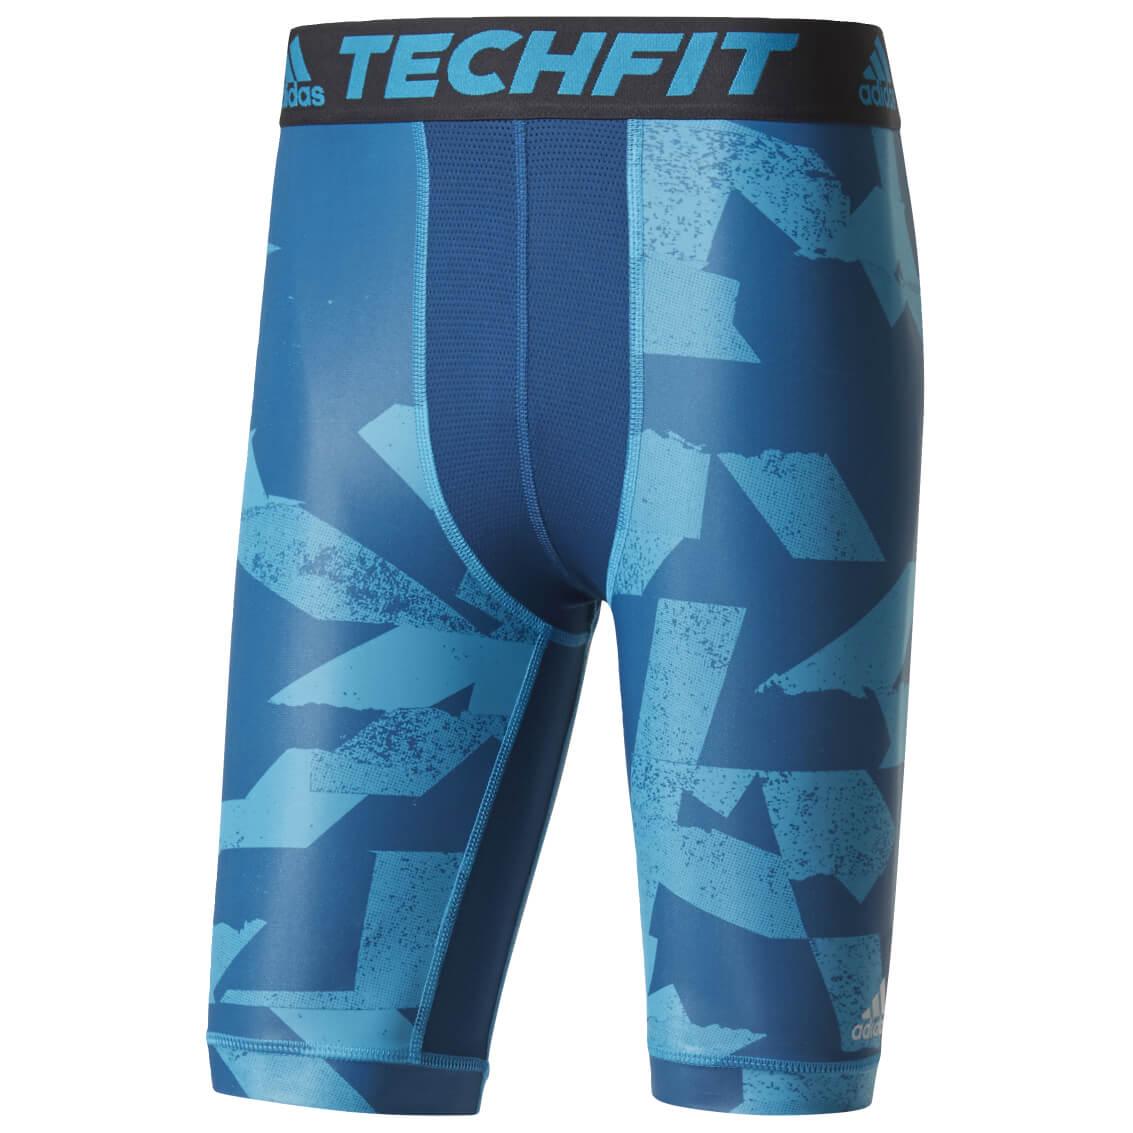 Print Adidas Tights Techfit Short Men's Chill Buy Online q44wZP